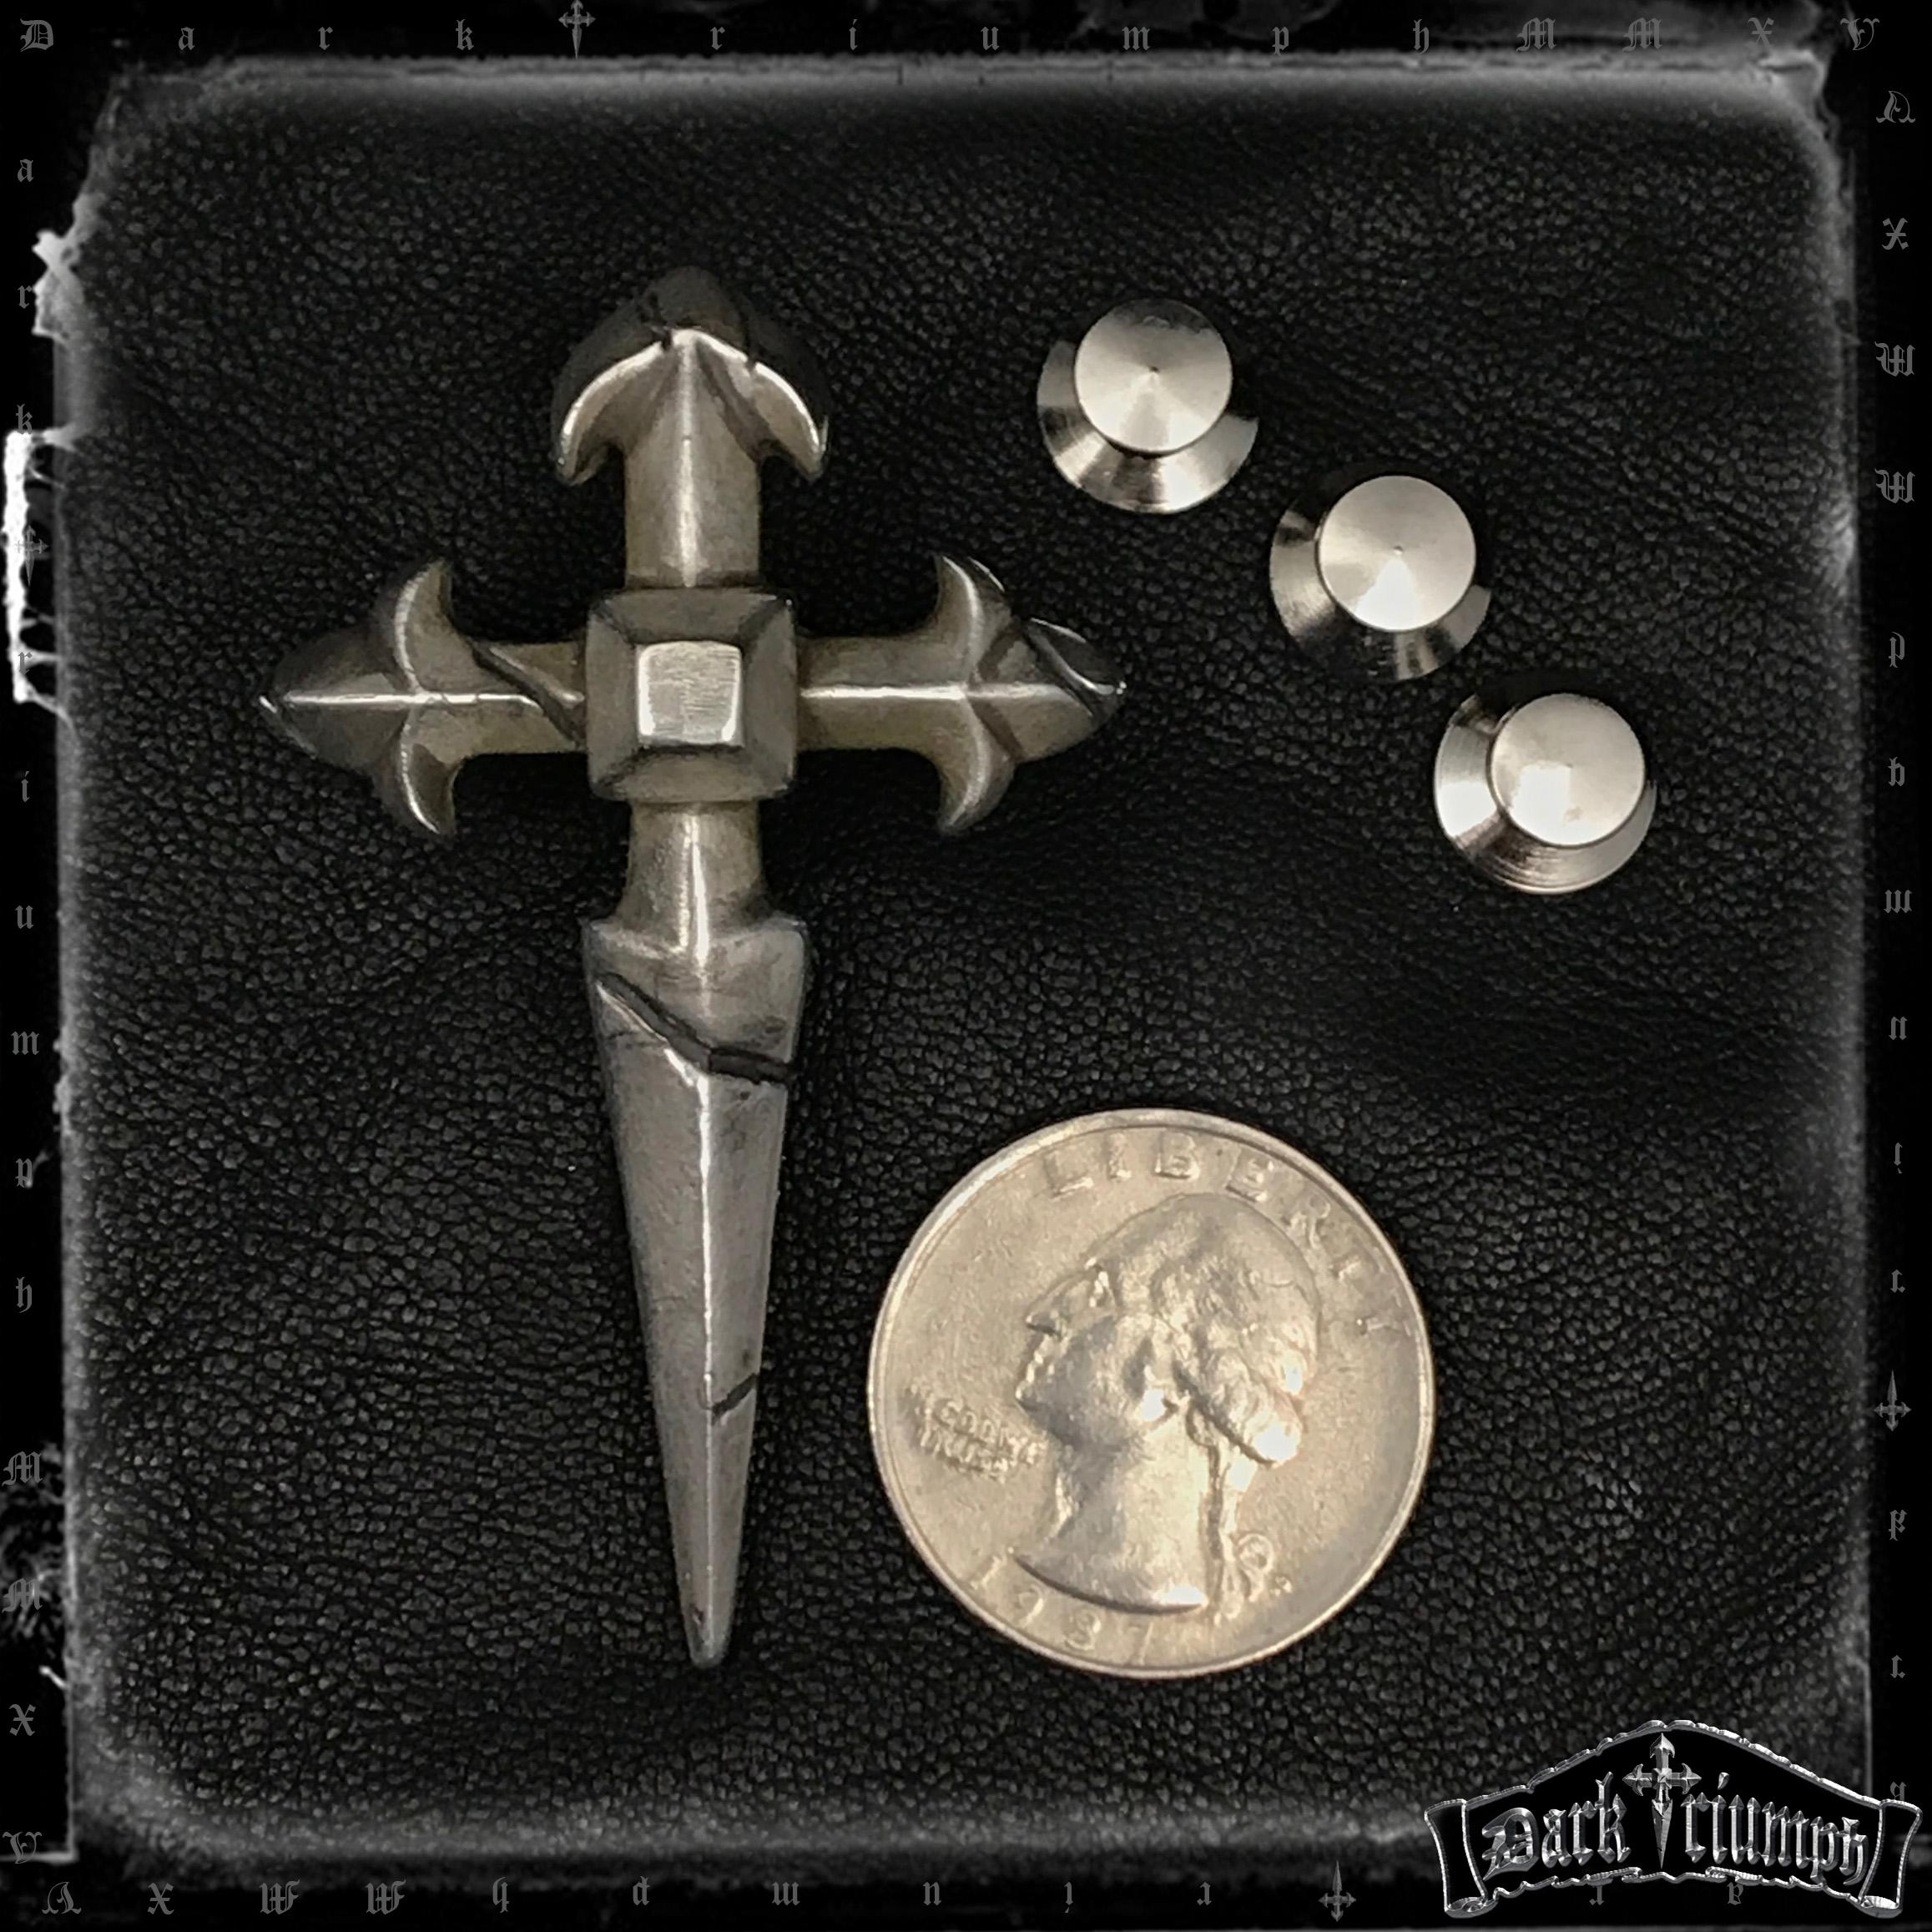 billy-idol-relic-cross-pin-2.jpg